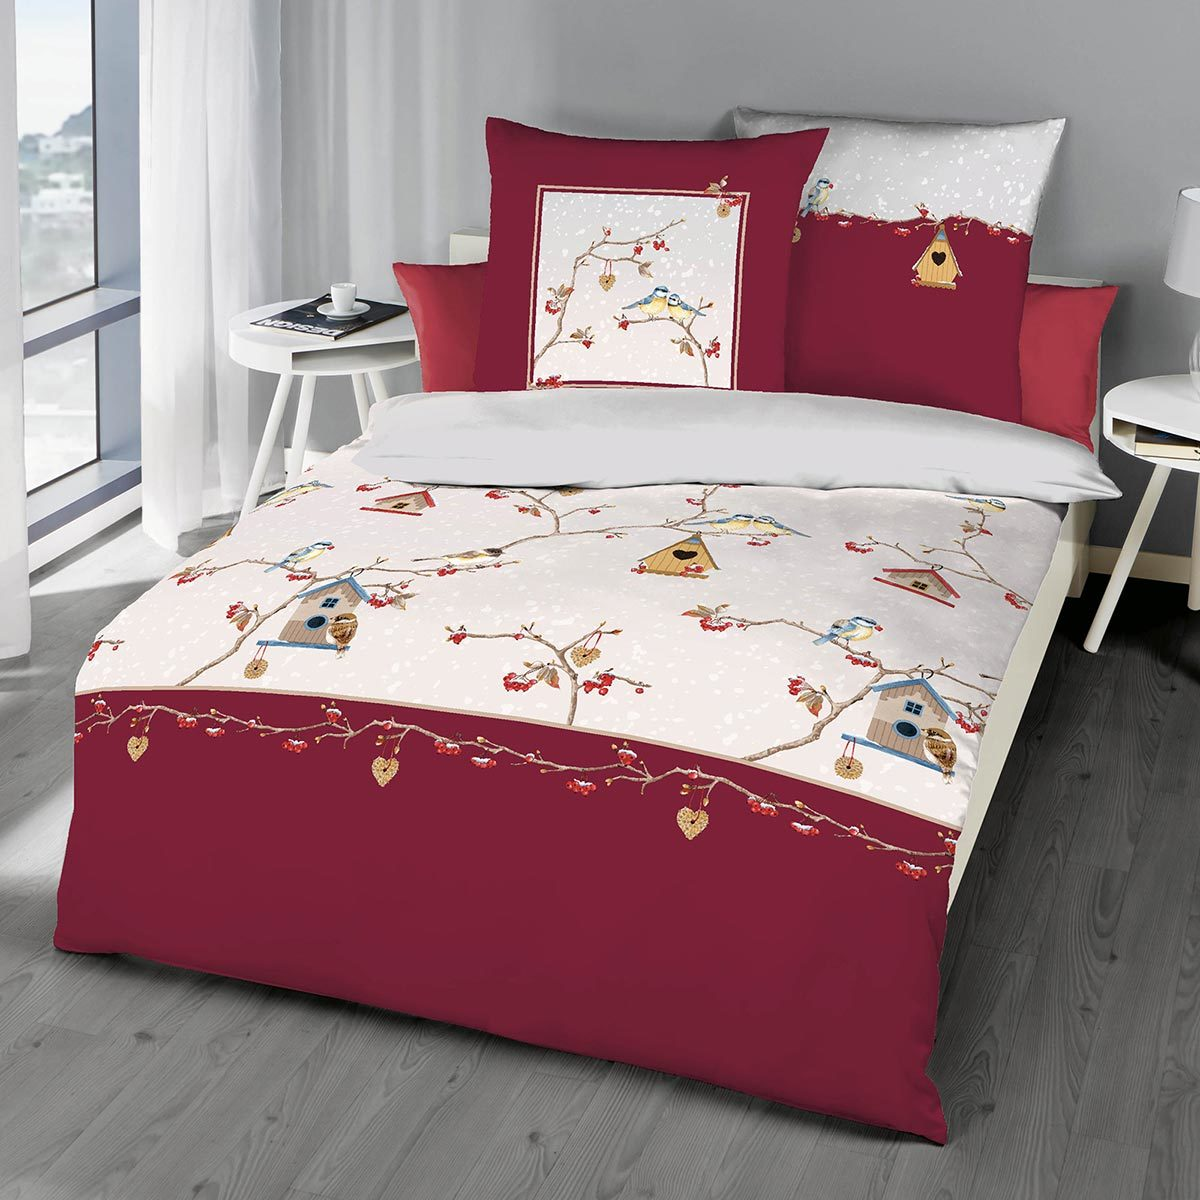 bettw sche biber rot kopfkissen bio heller schimmel im. Black Bedroom Furniture Sets. Home Design Ideas